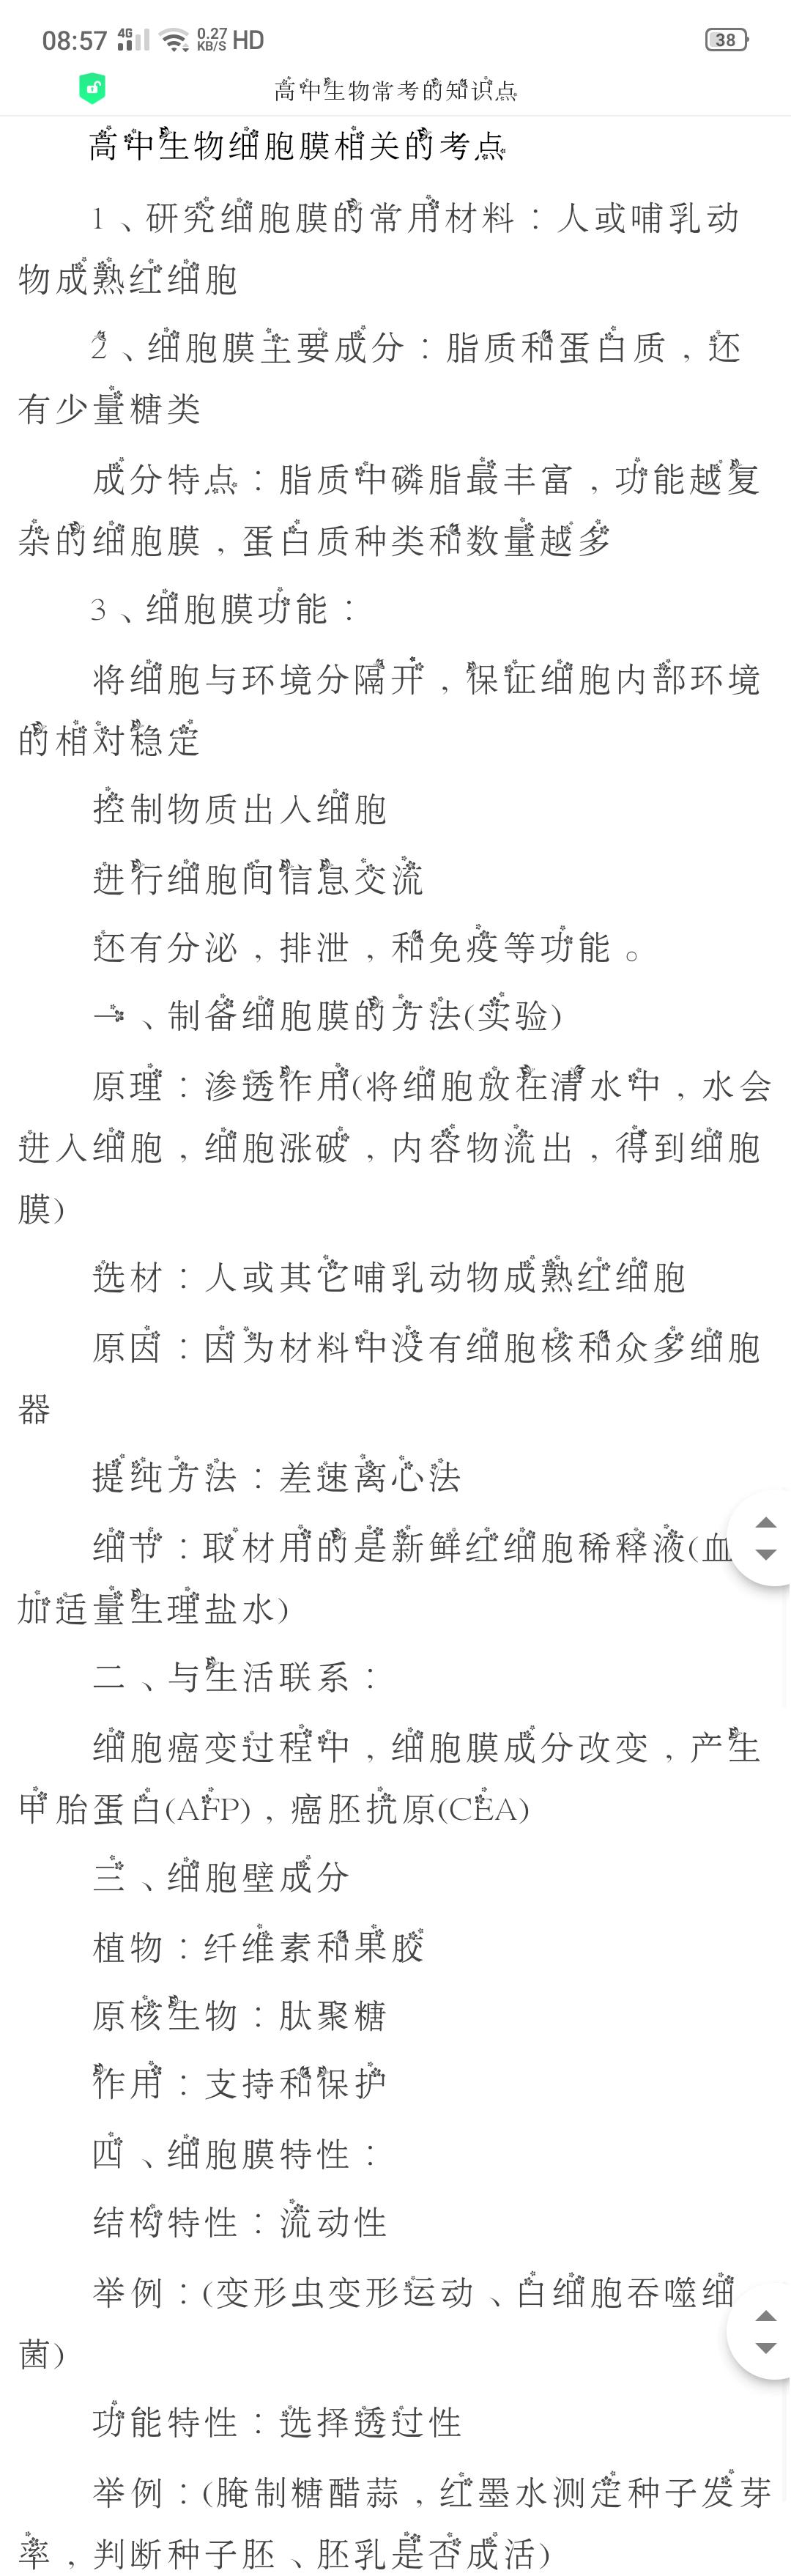 Screenshot_2019-07-26-08-57-36-03.png